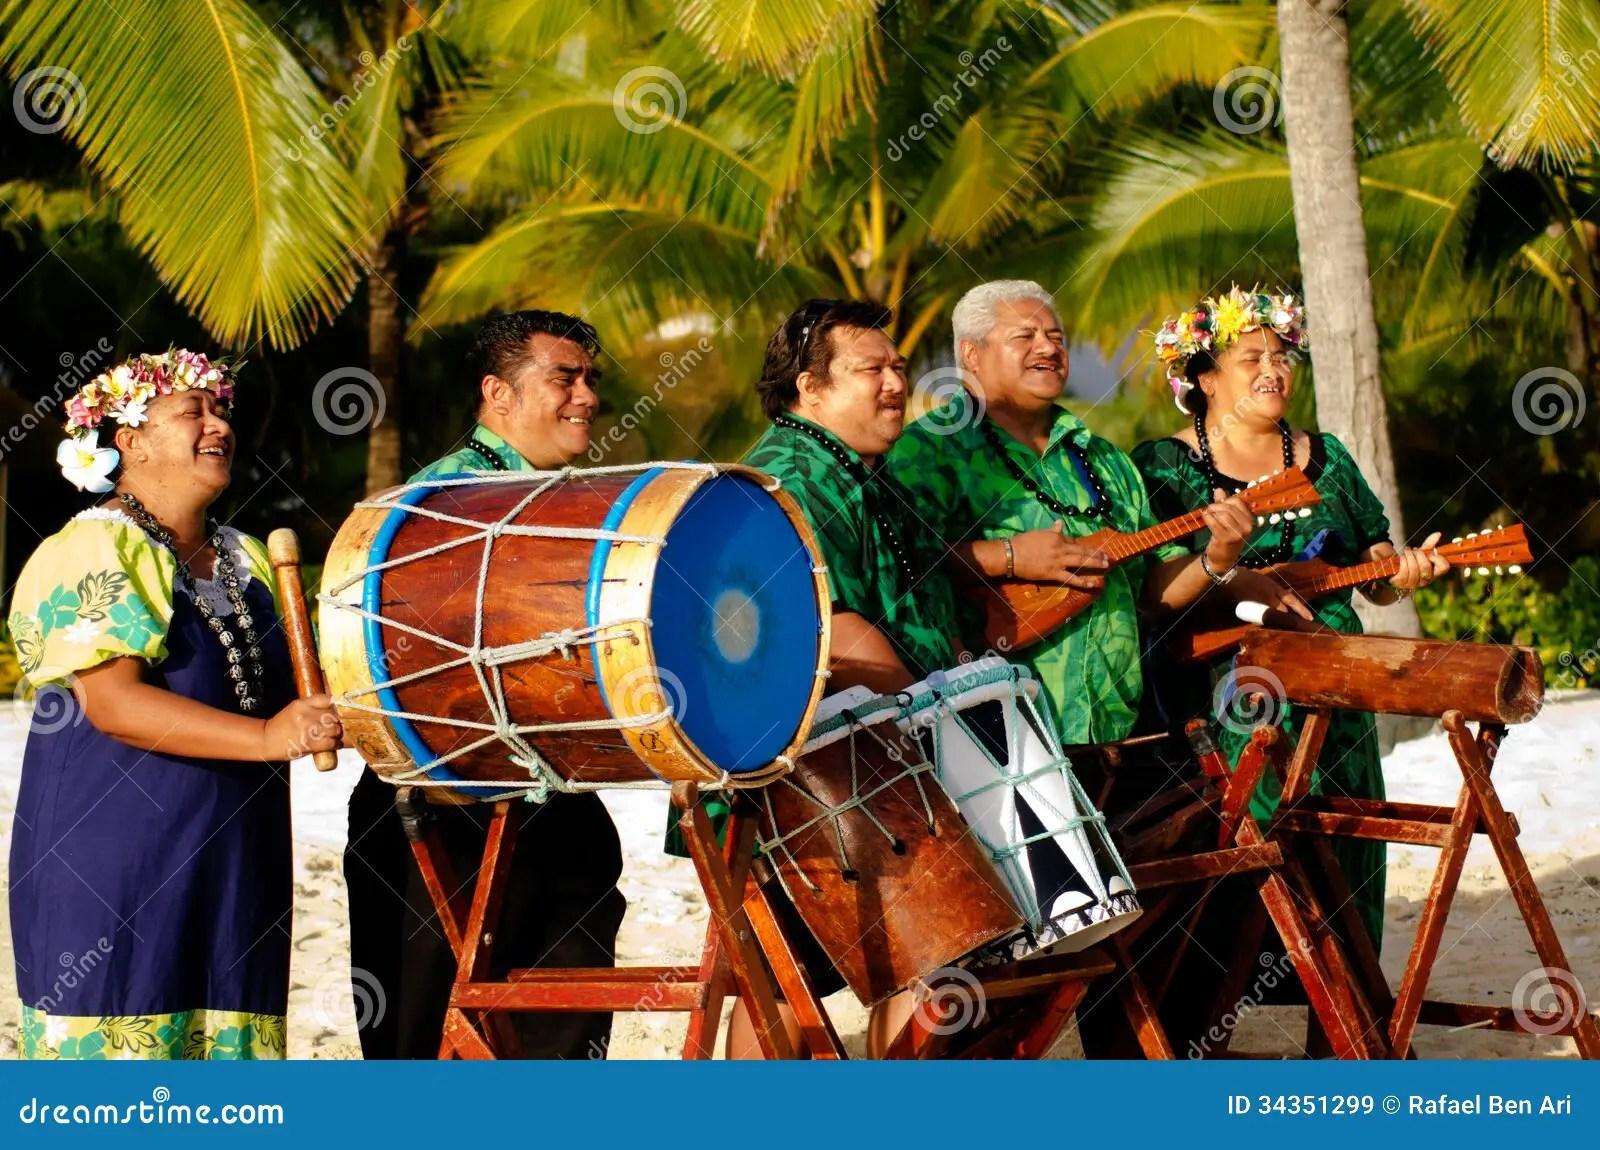 Polynesian Pacific Island Tahitian Music Group Royalty